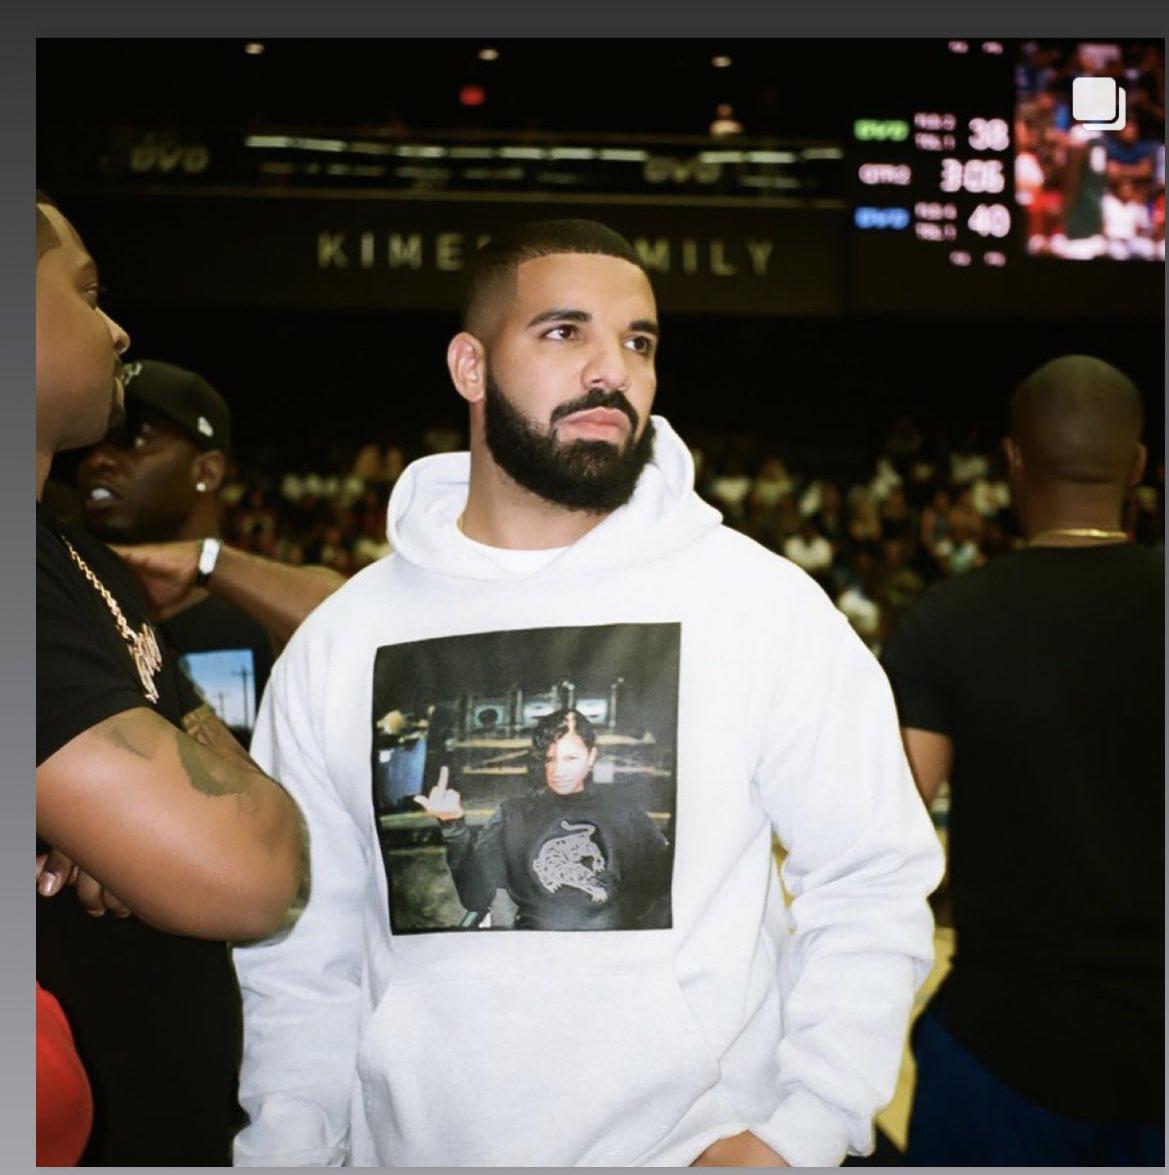 @Zendaya i'm gonna buy this hoodie